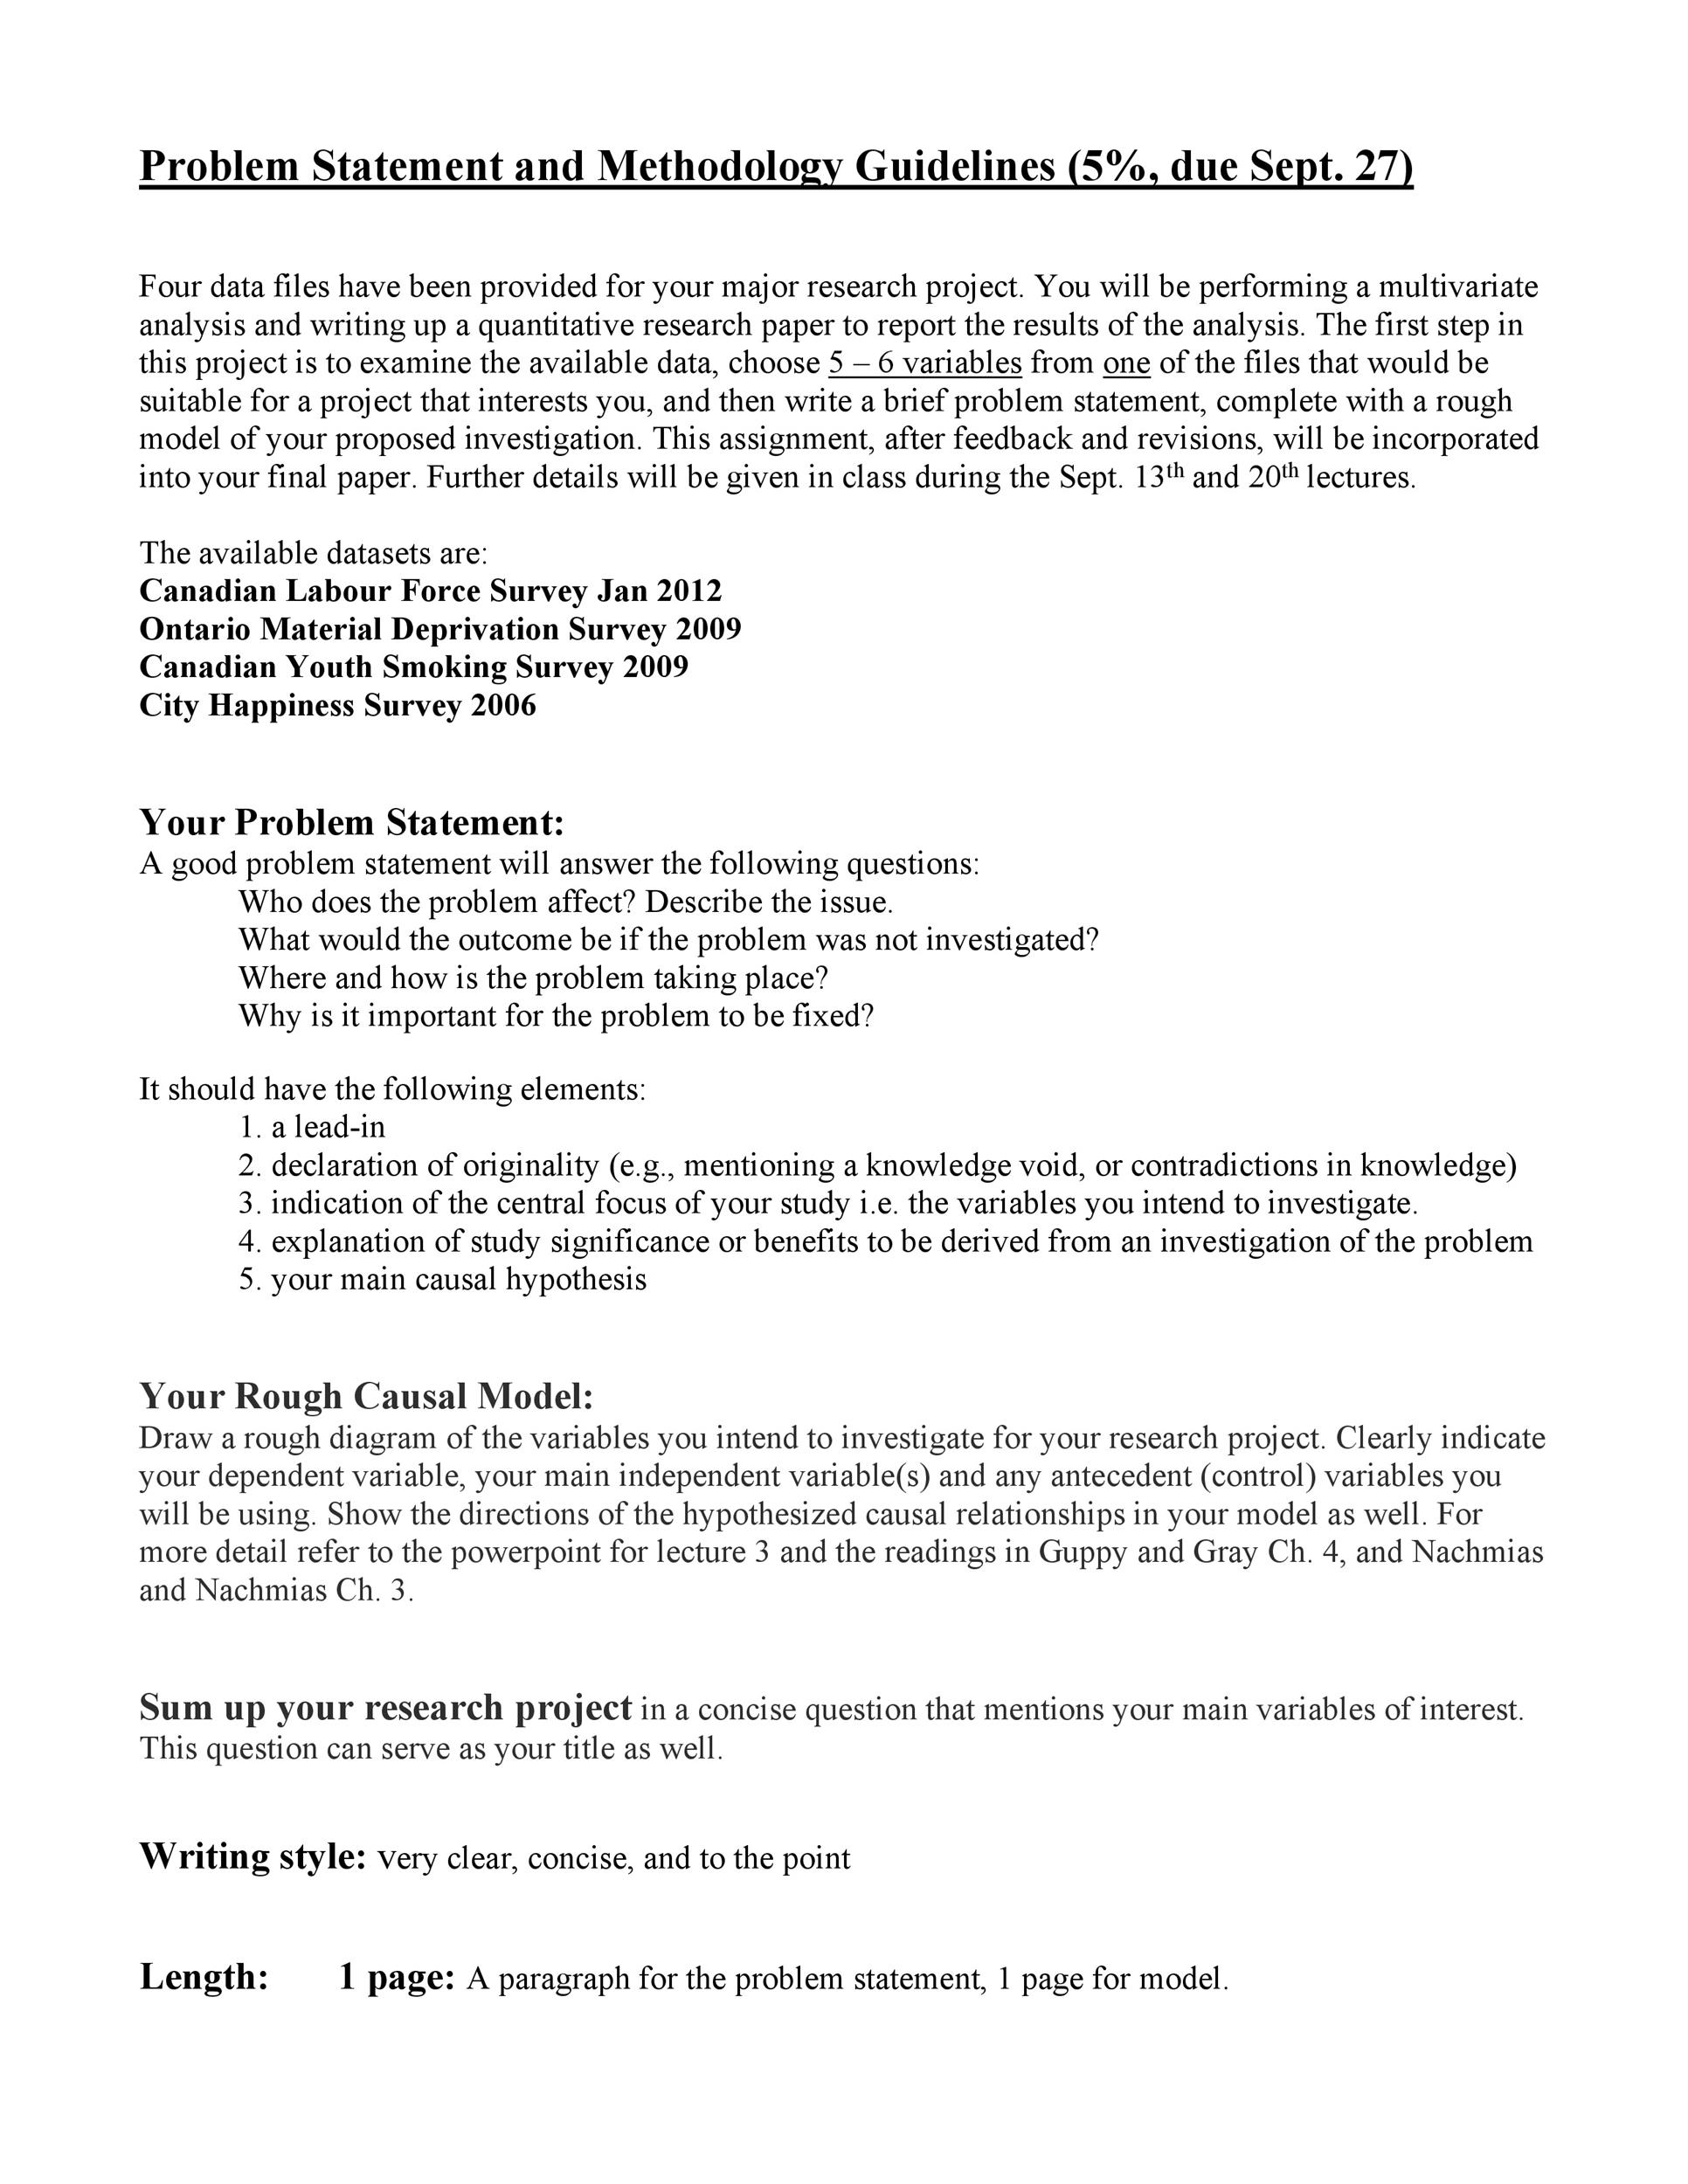 Free Problem Statement Template 13